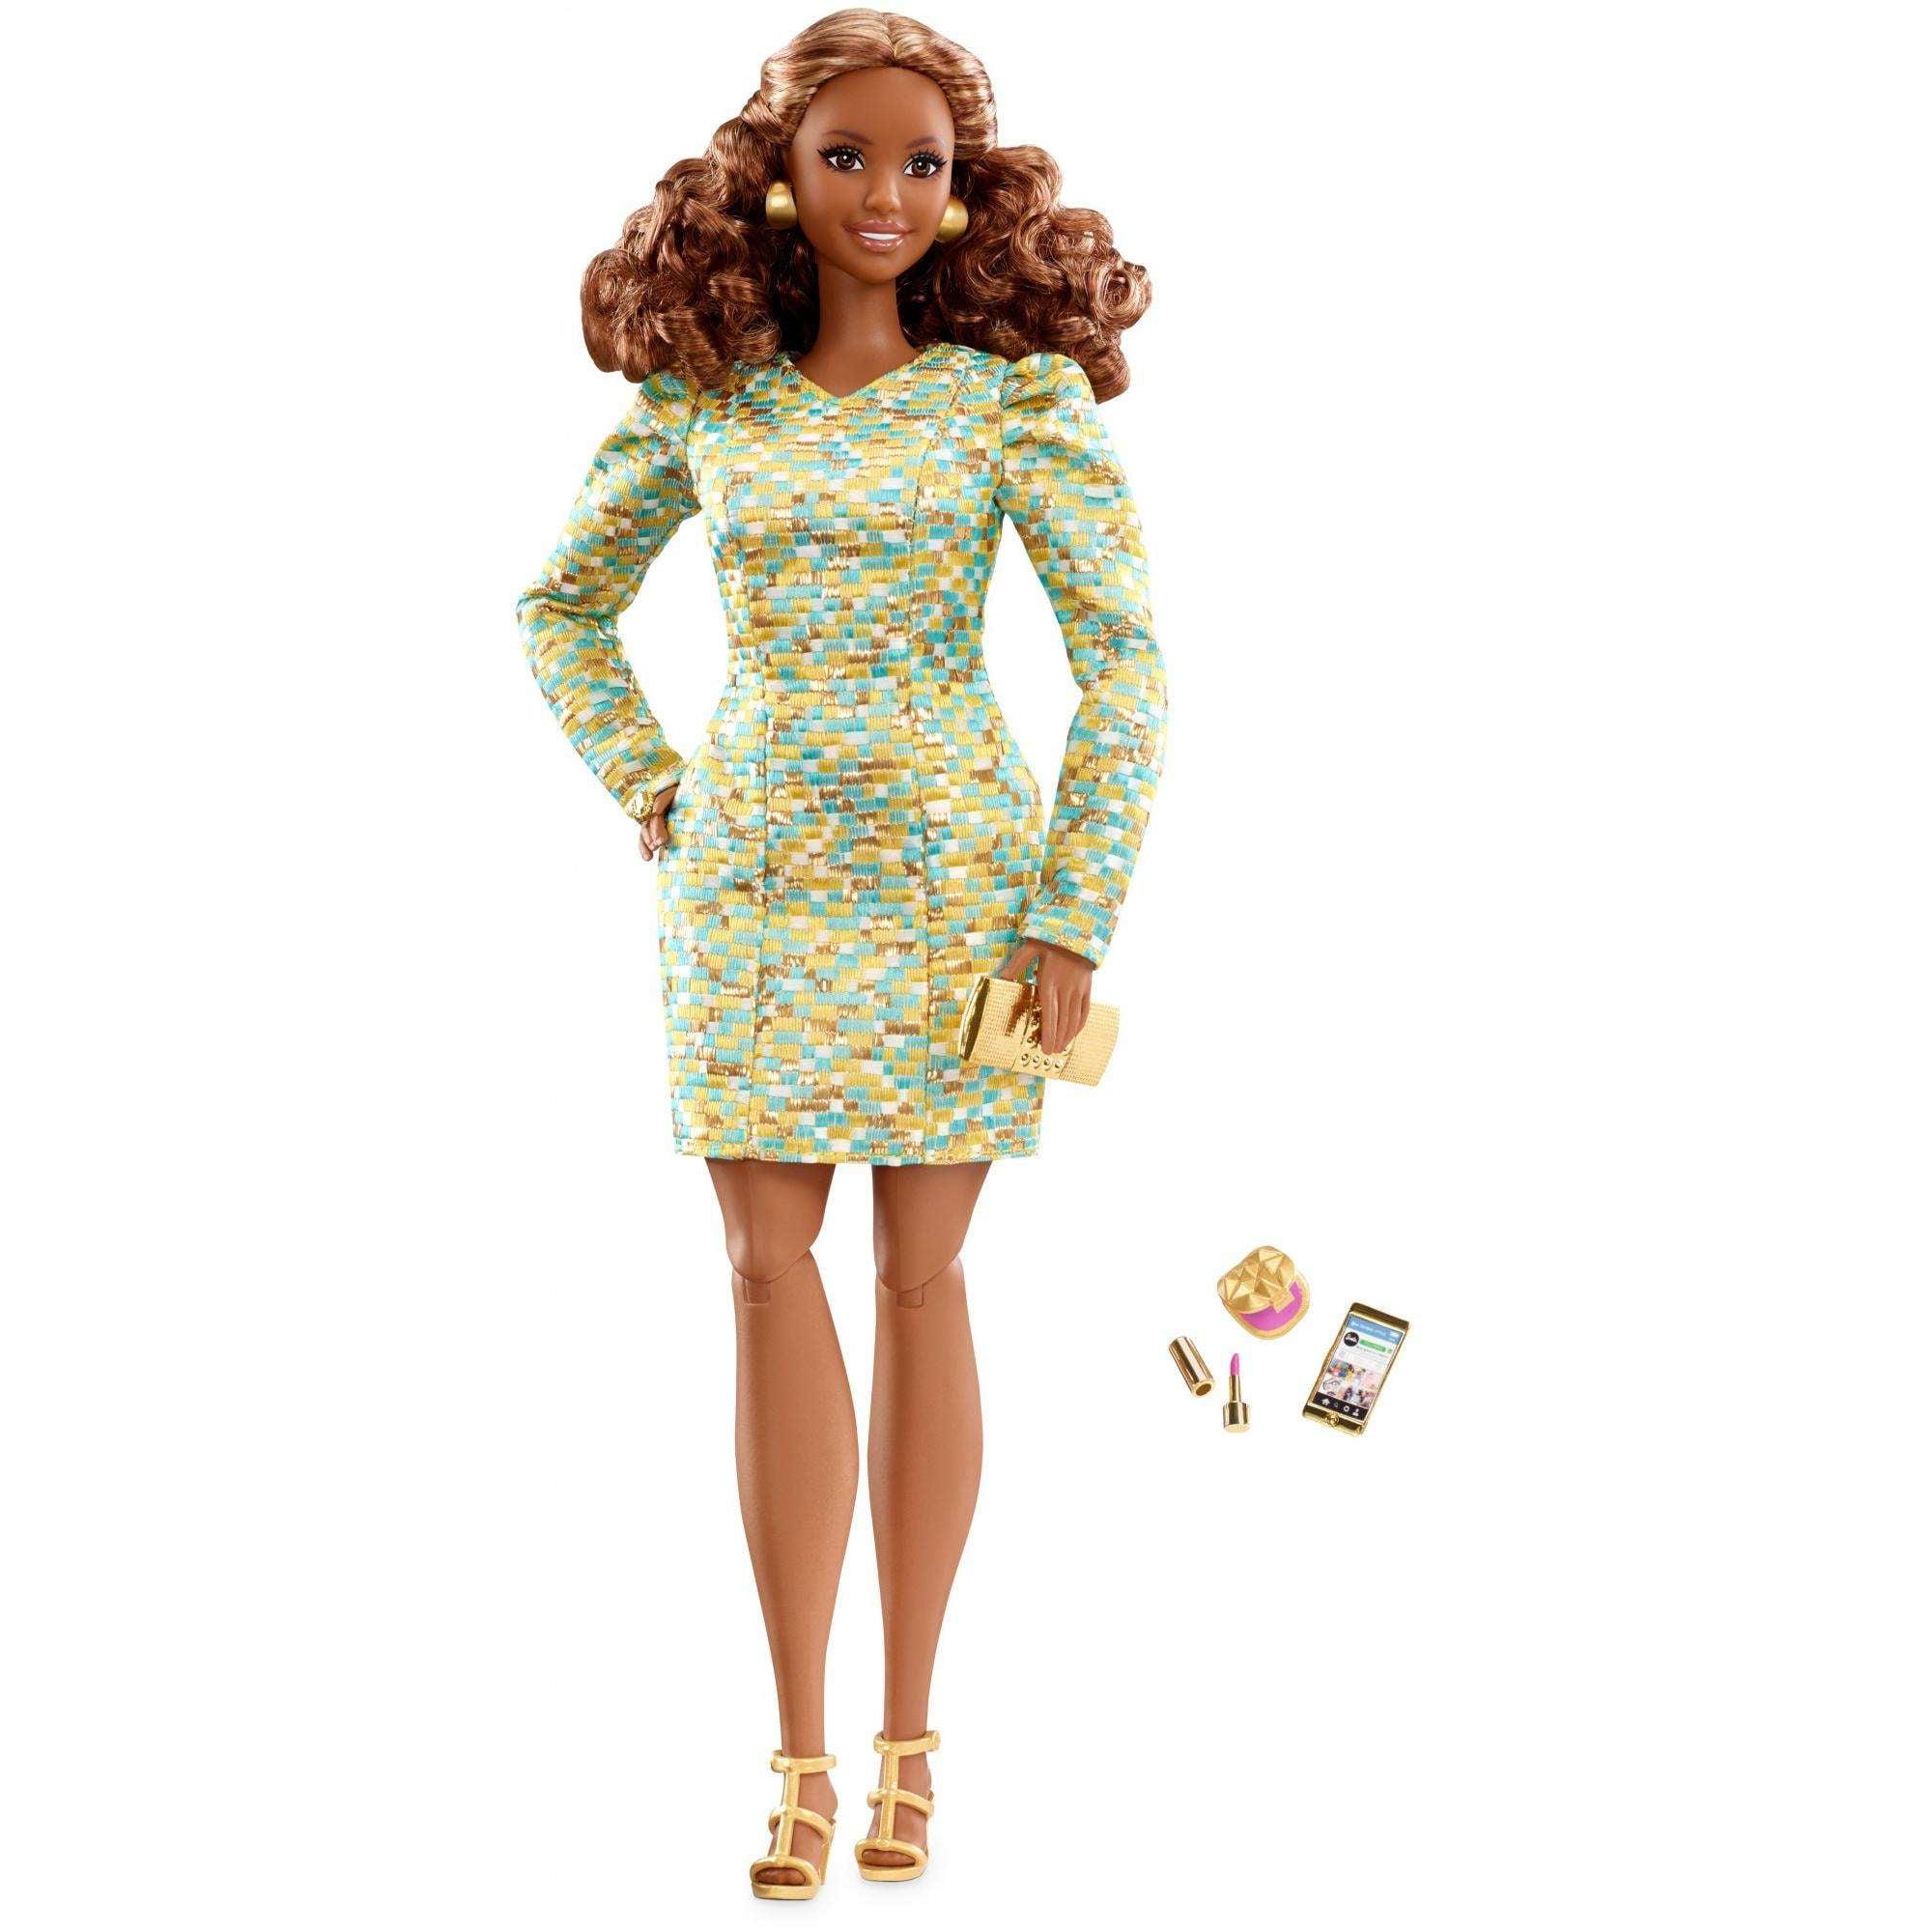 Barbie The Look Doll Metallic Mini by Mattel